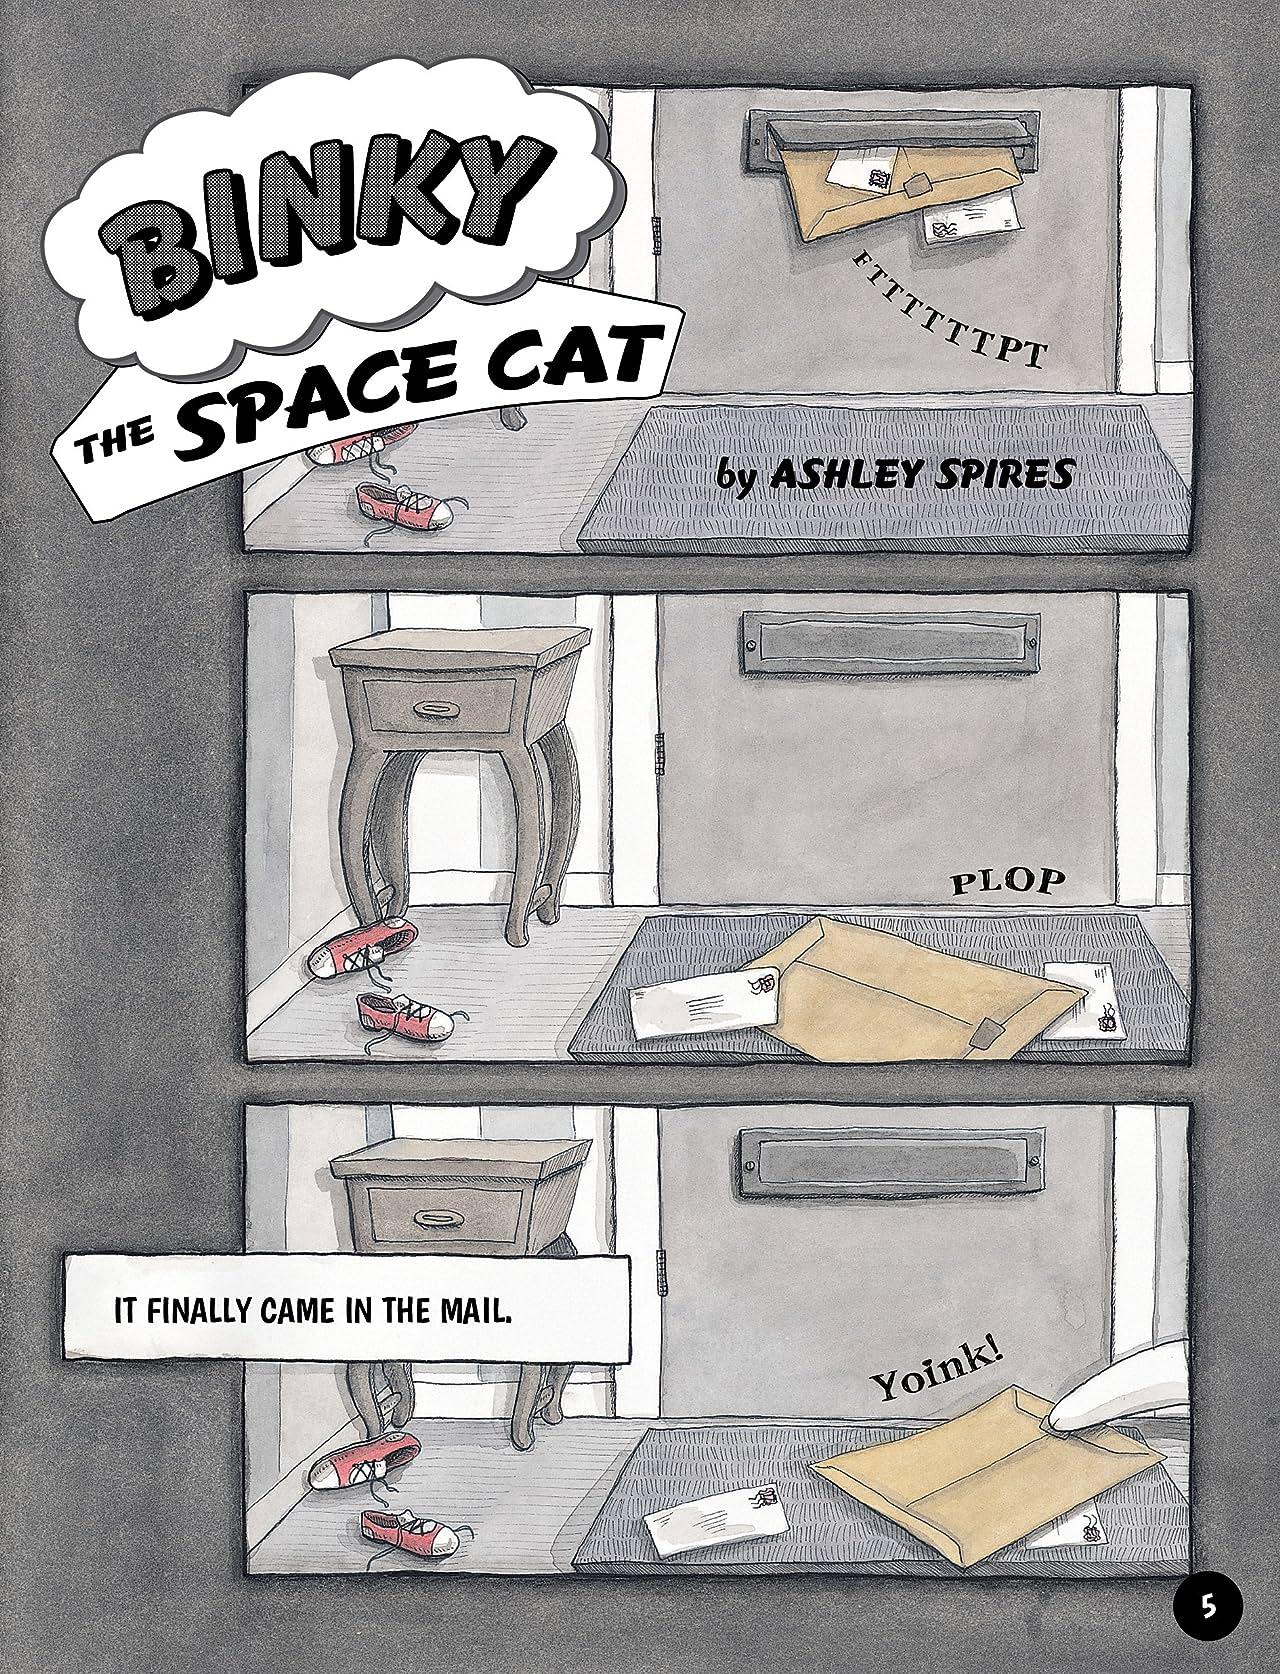 A Binky Adventure Vol. 1: Binky the Space Cat